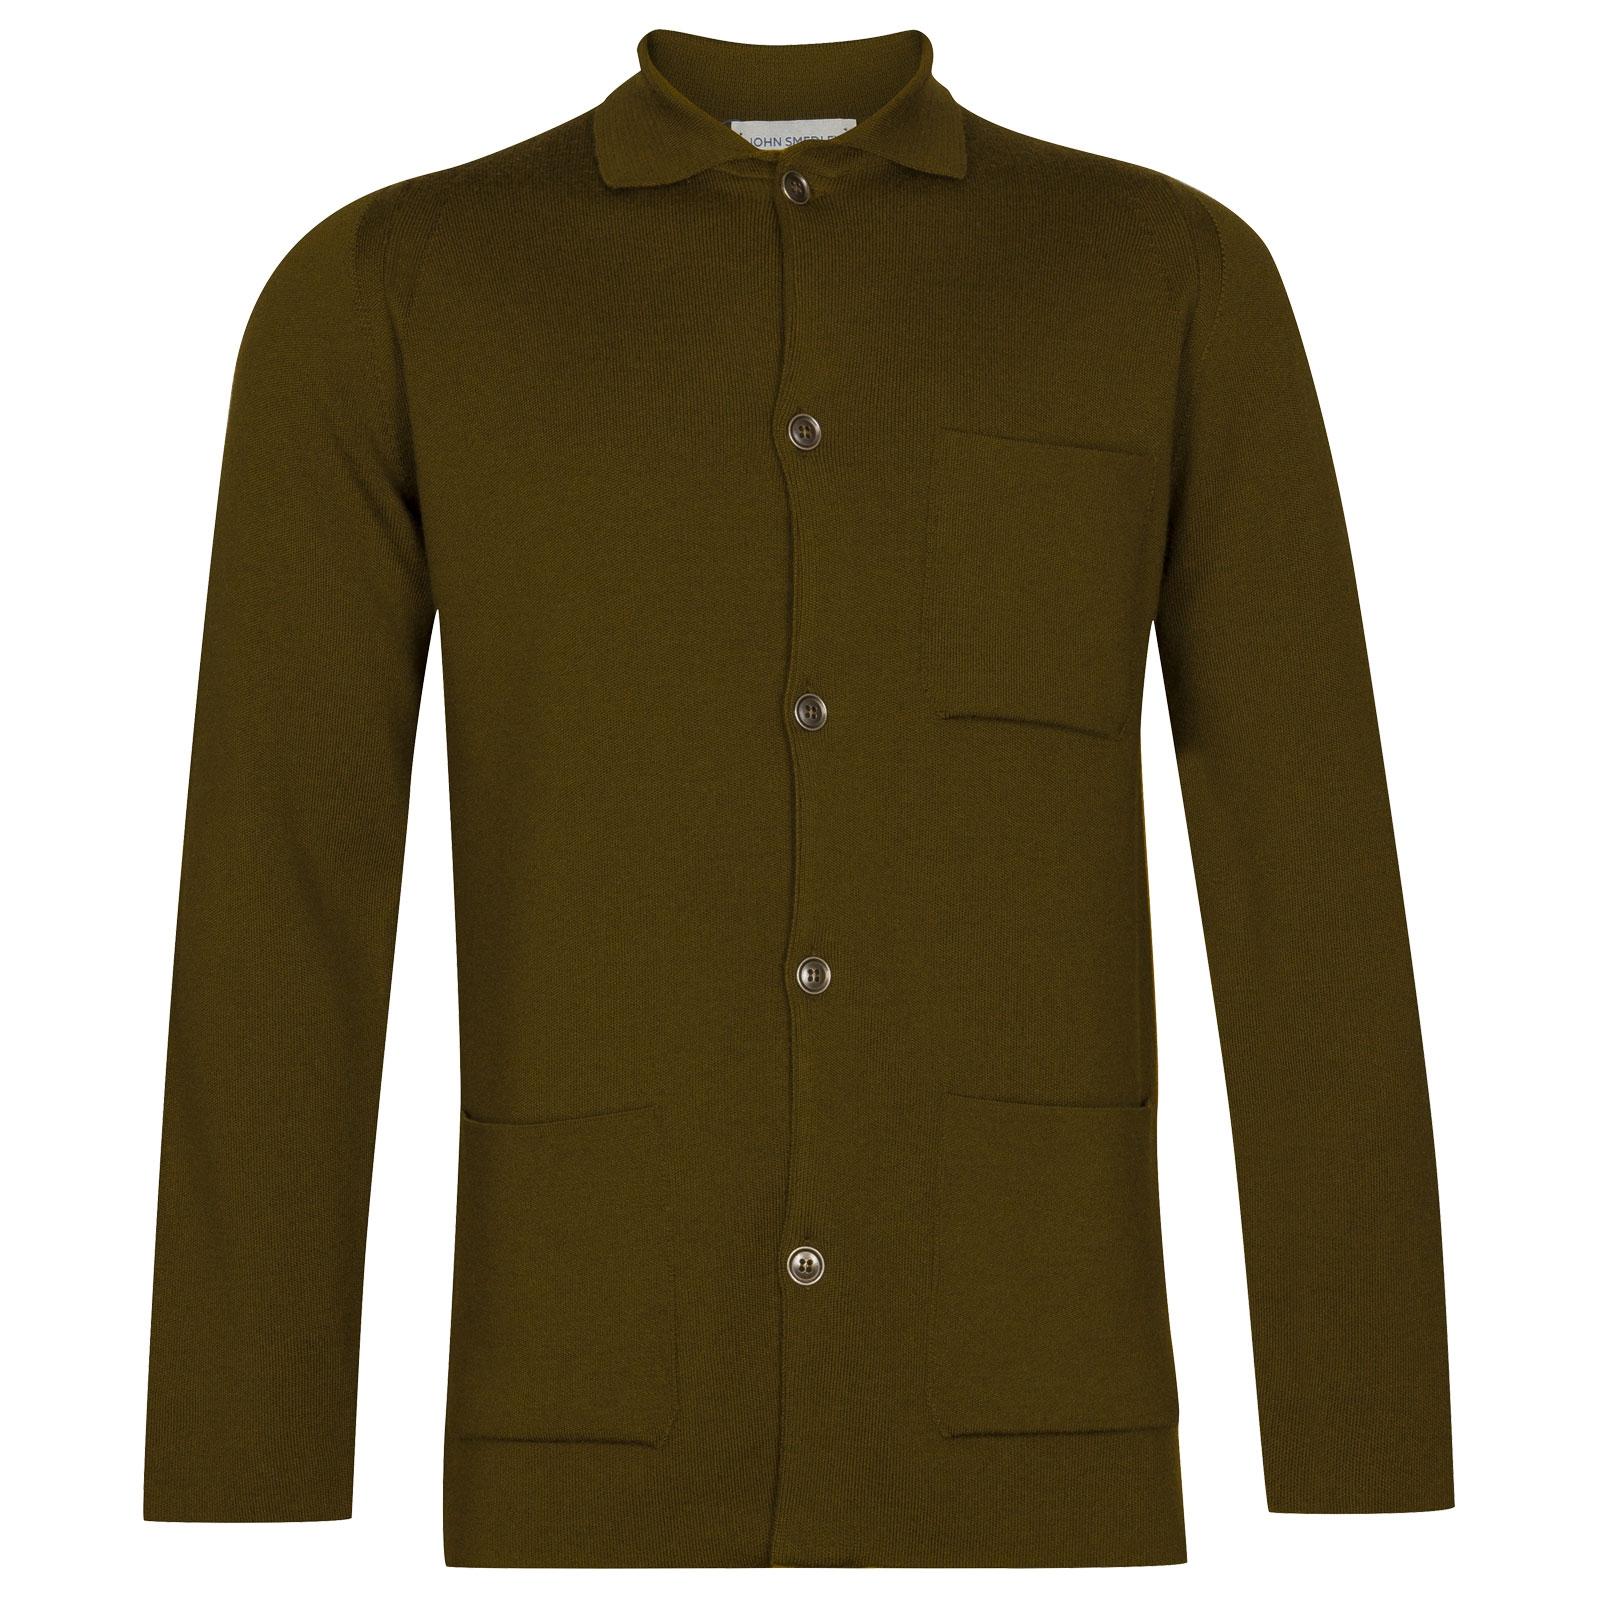 John Smedley Copper Merino Wool Jacket in Khaki-XL